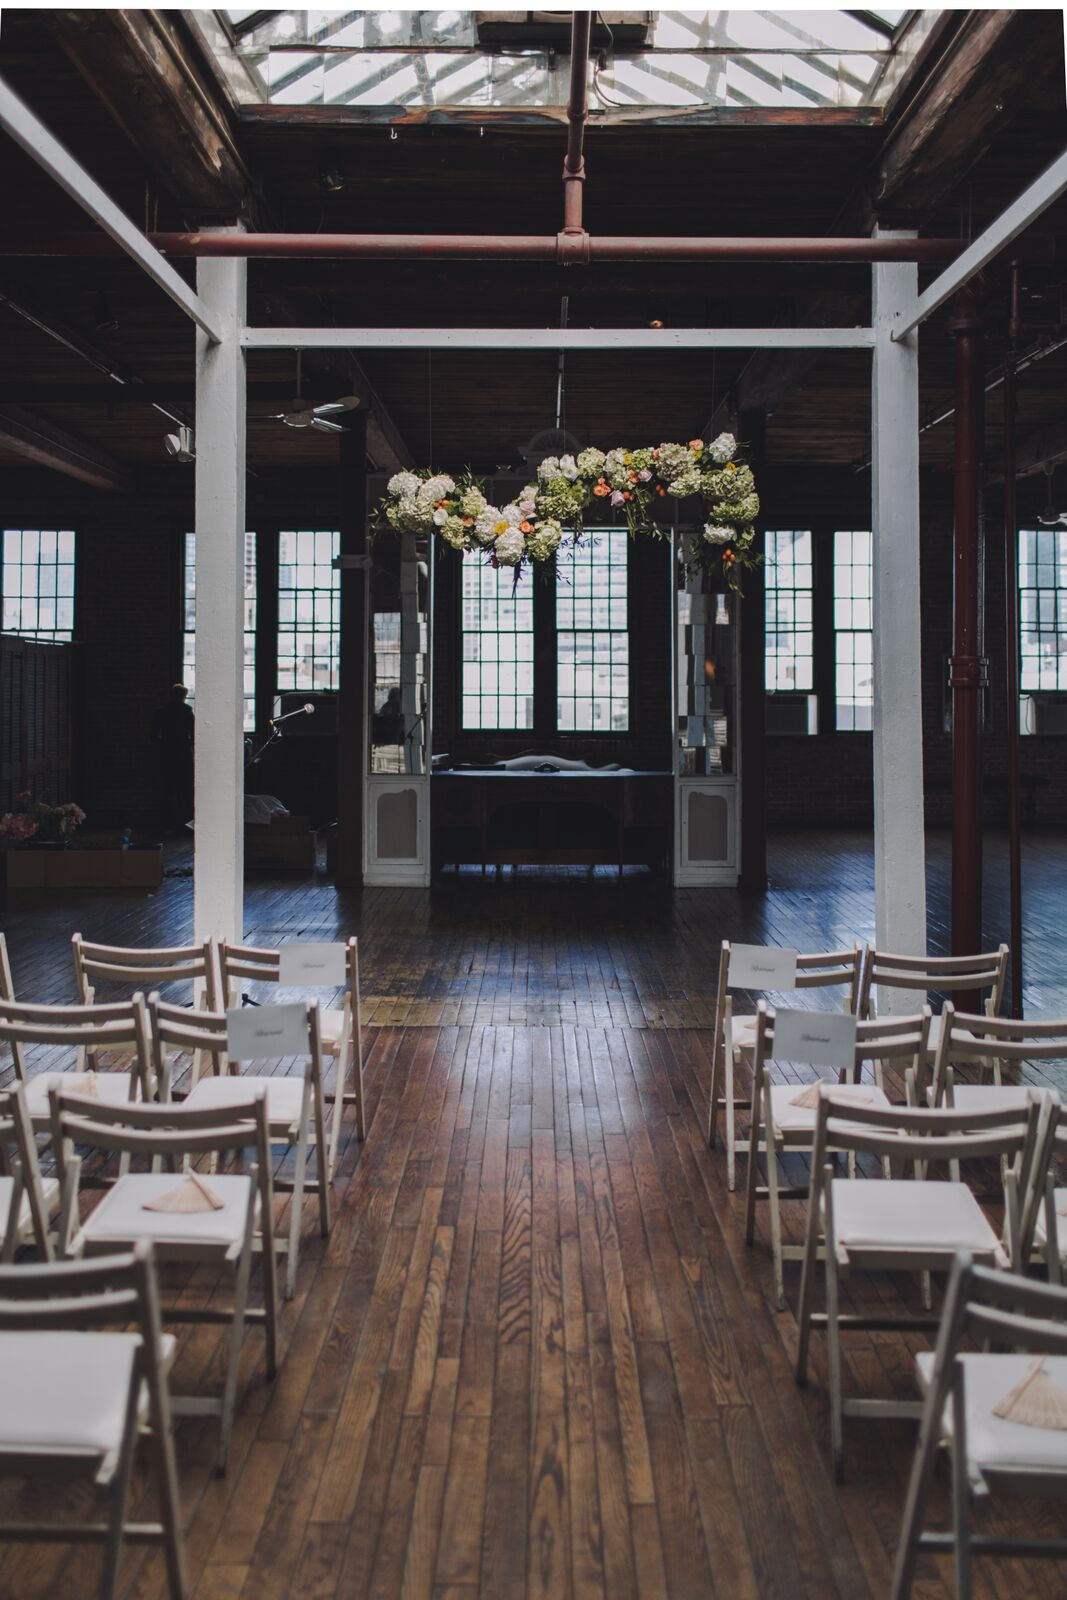 Ryan and Alex Industrial Metropolitan Building Long Island City Bride and Groom Couple Sustainable Eco-friendly wedding celebration venue